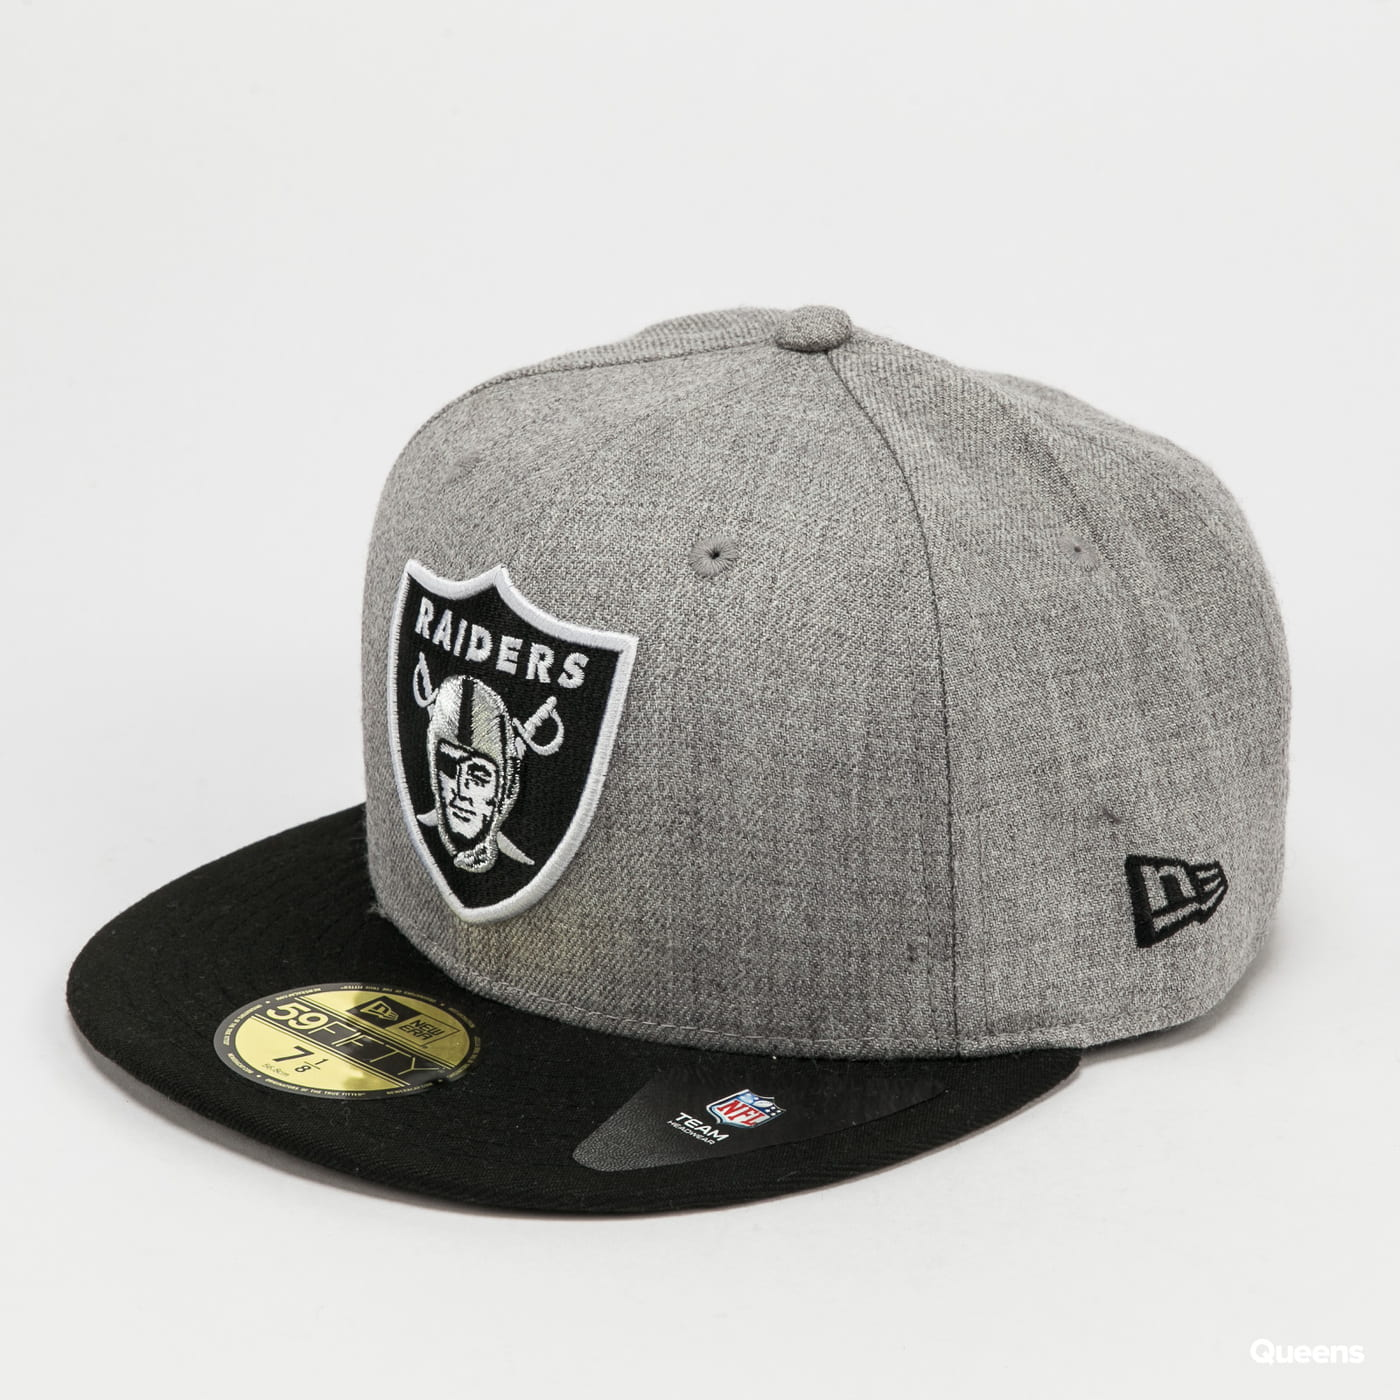 New Era 5950 NFL Heather Essential Raiders melange gray / black